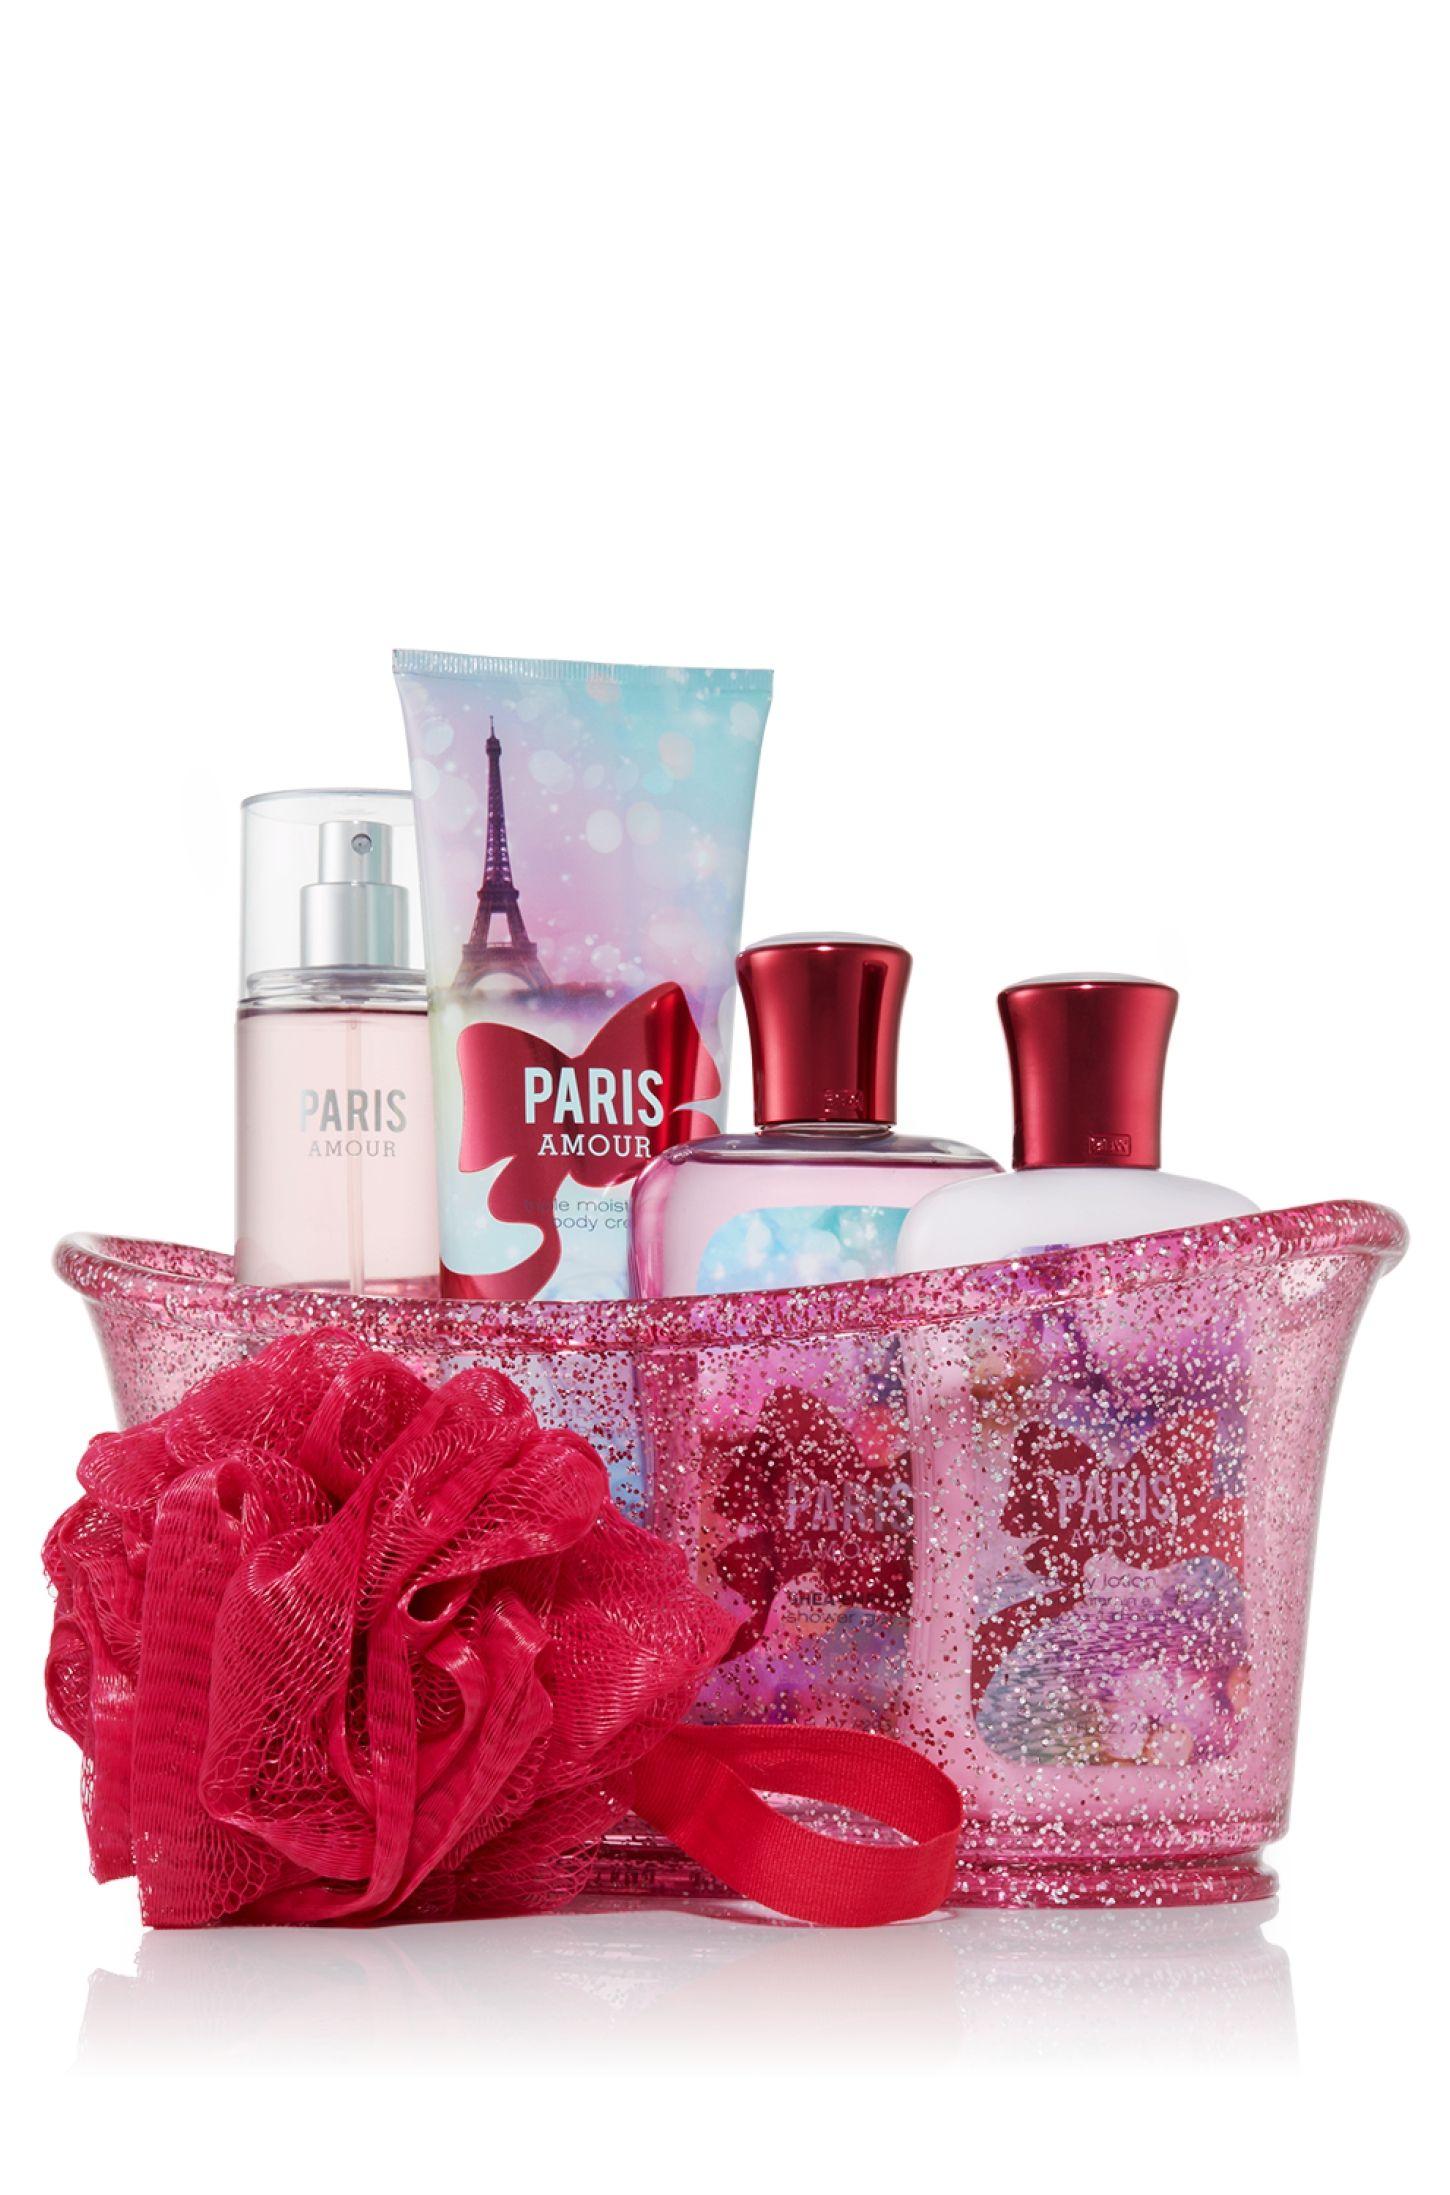 Paris amour splish splash gift set signature collection